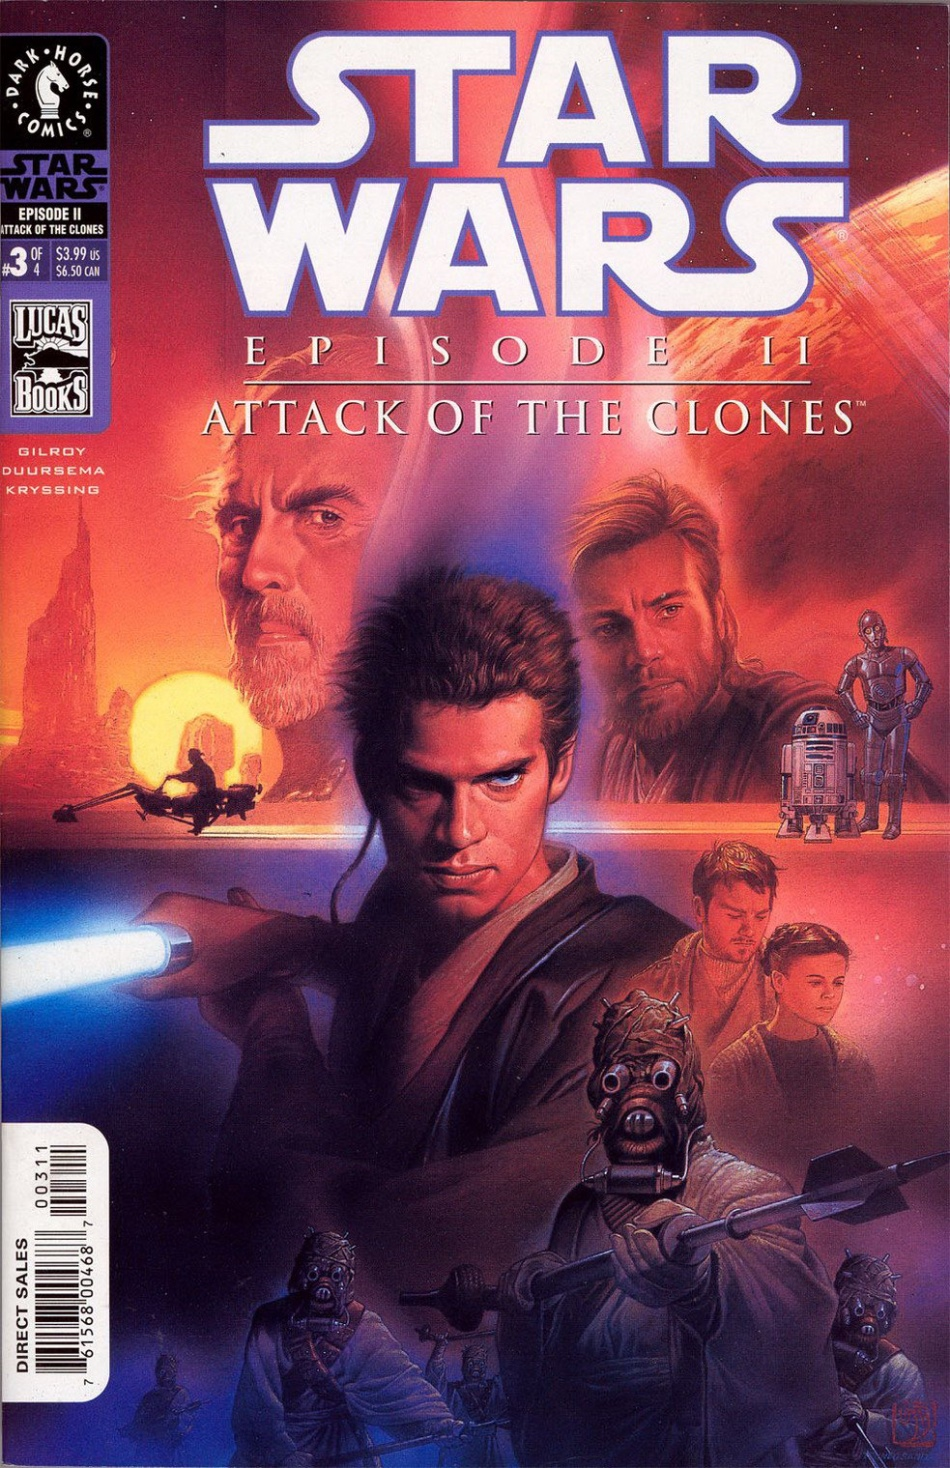 Episode II: Attack of the Clones #3 (01.05.2002)